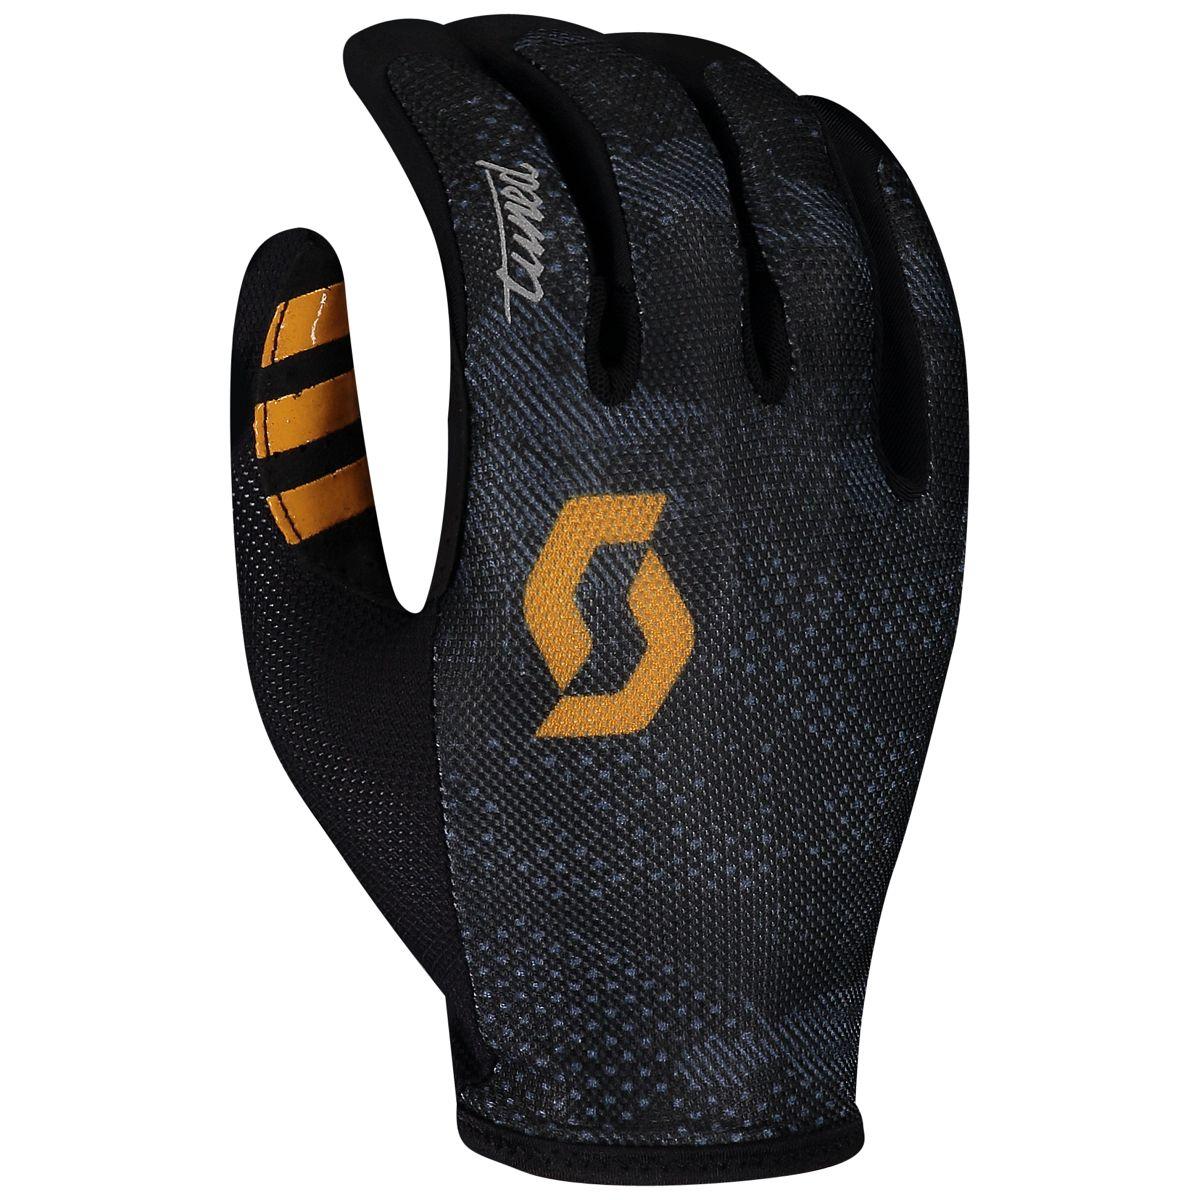 Scott Traction Tuned Fahrrad Handschuhe lang schwarz 2020